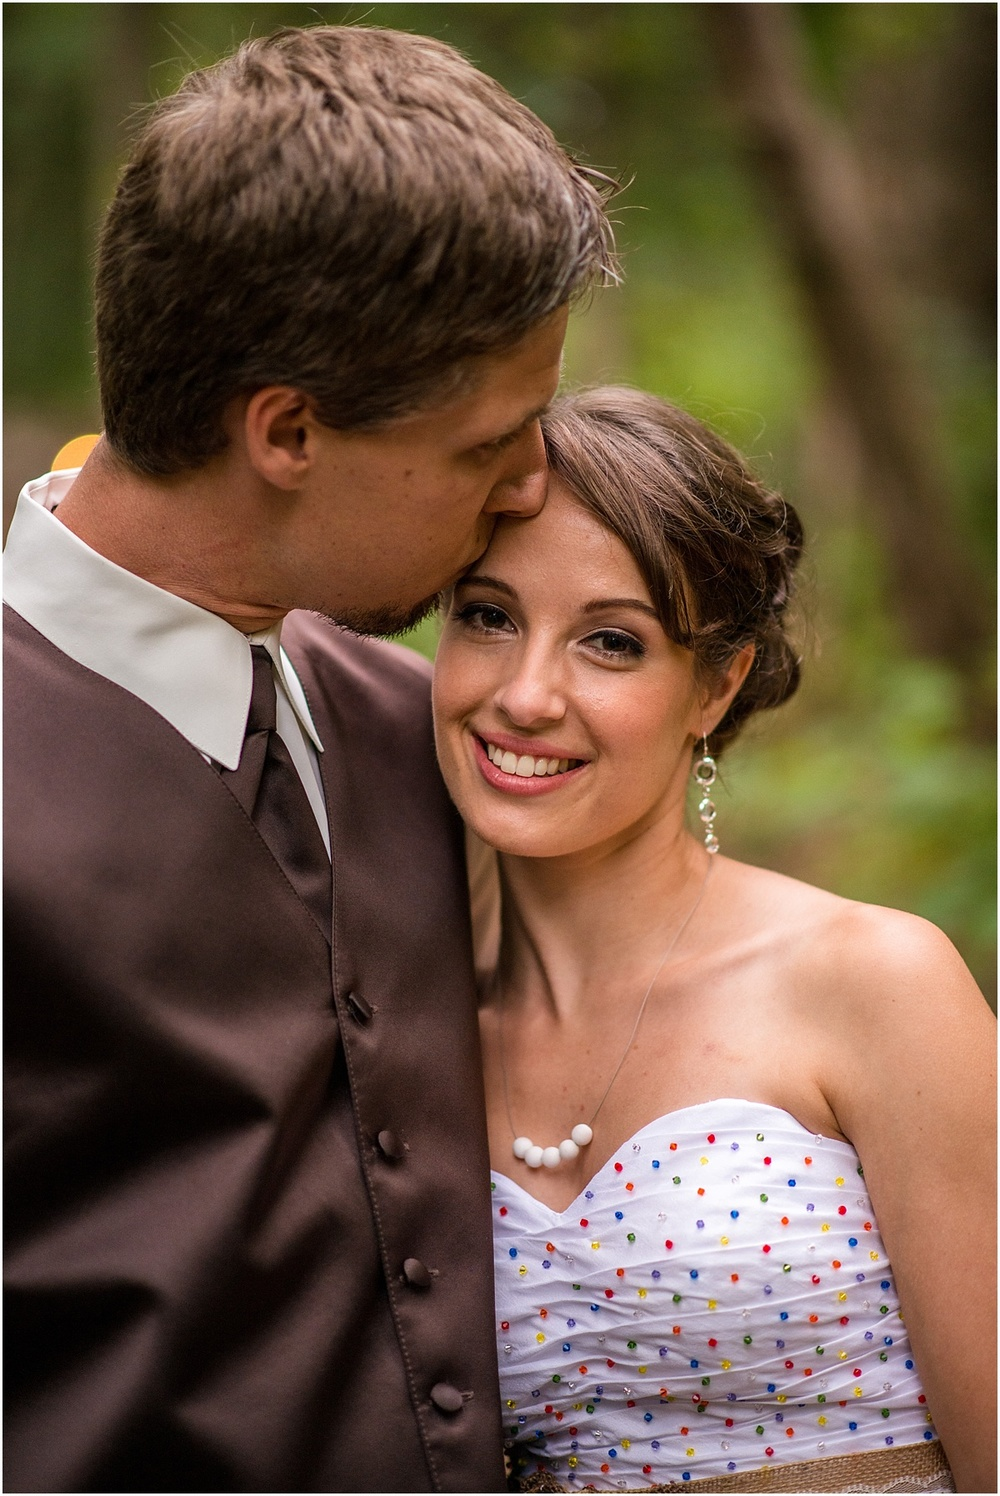 Greg Smit Photography Nashville wedding photographer the Wrens Nest_012